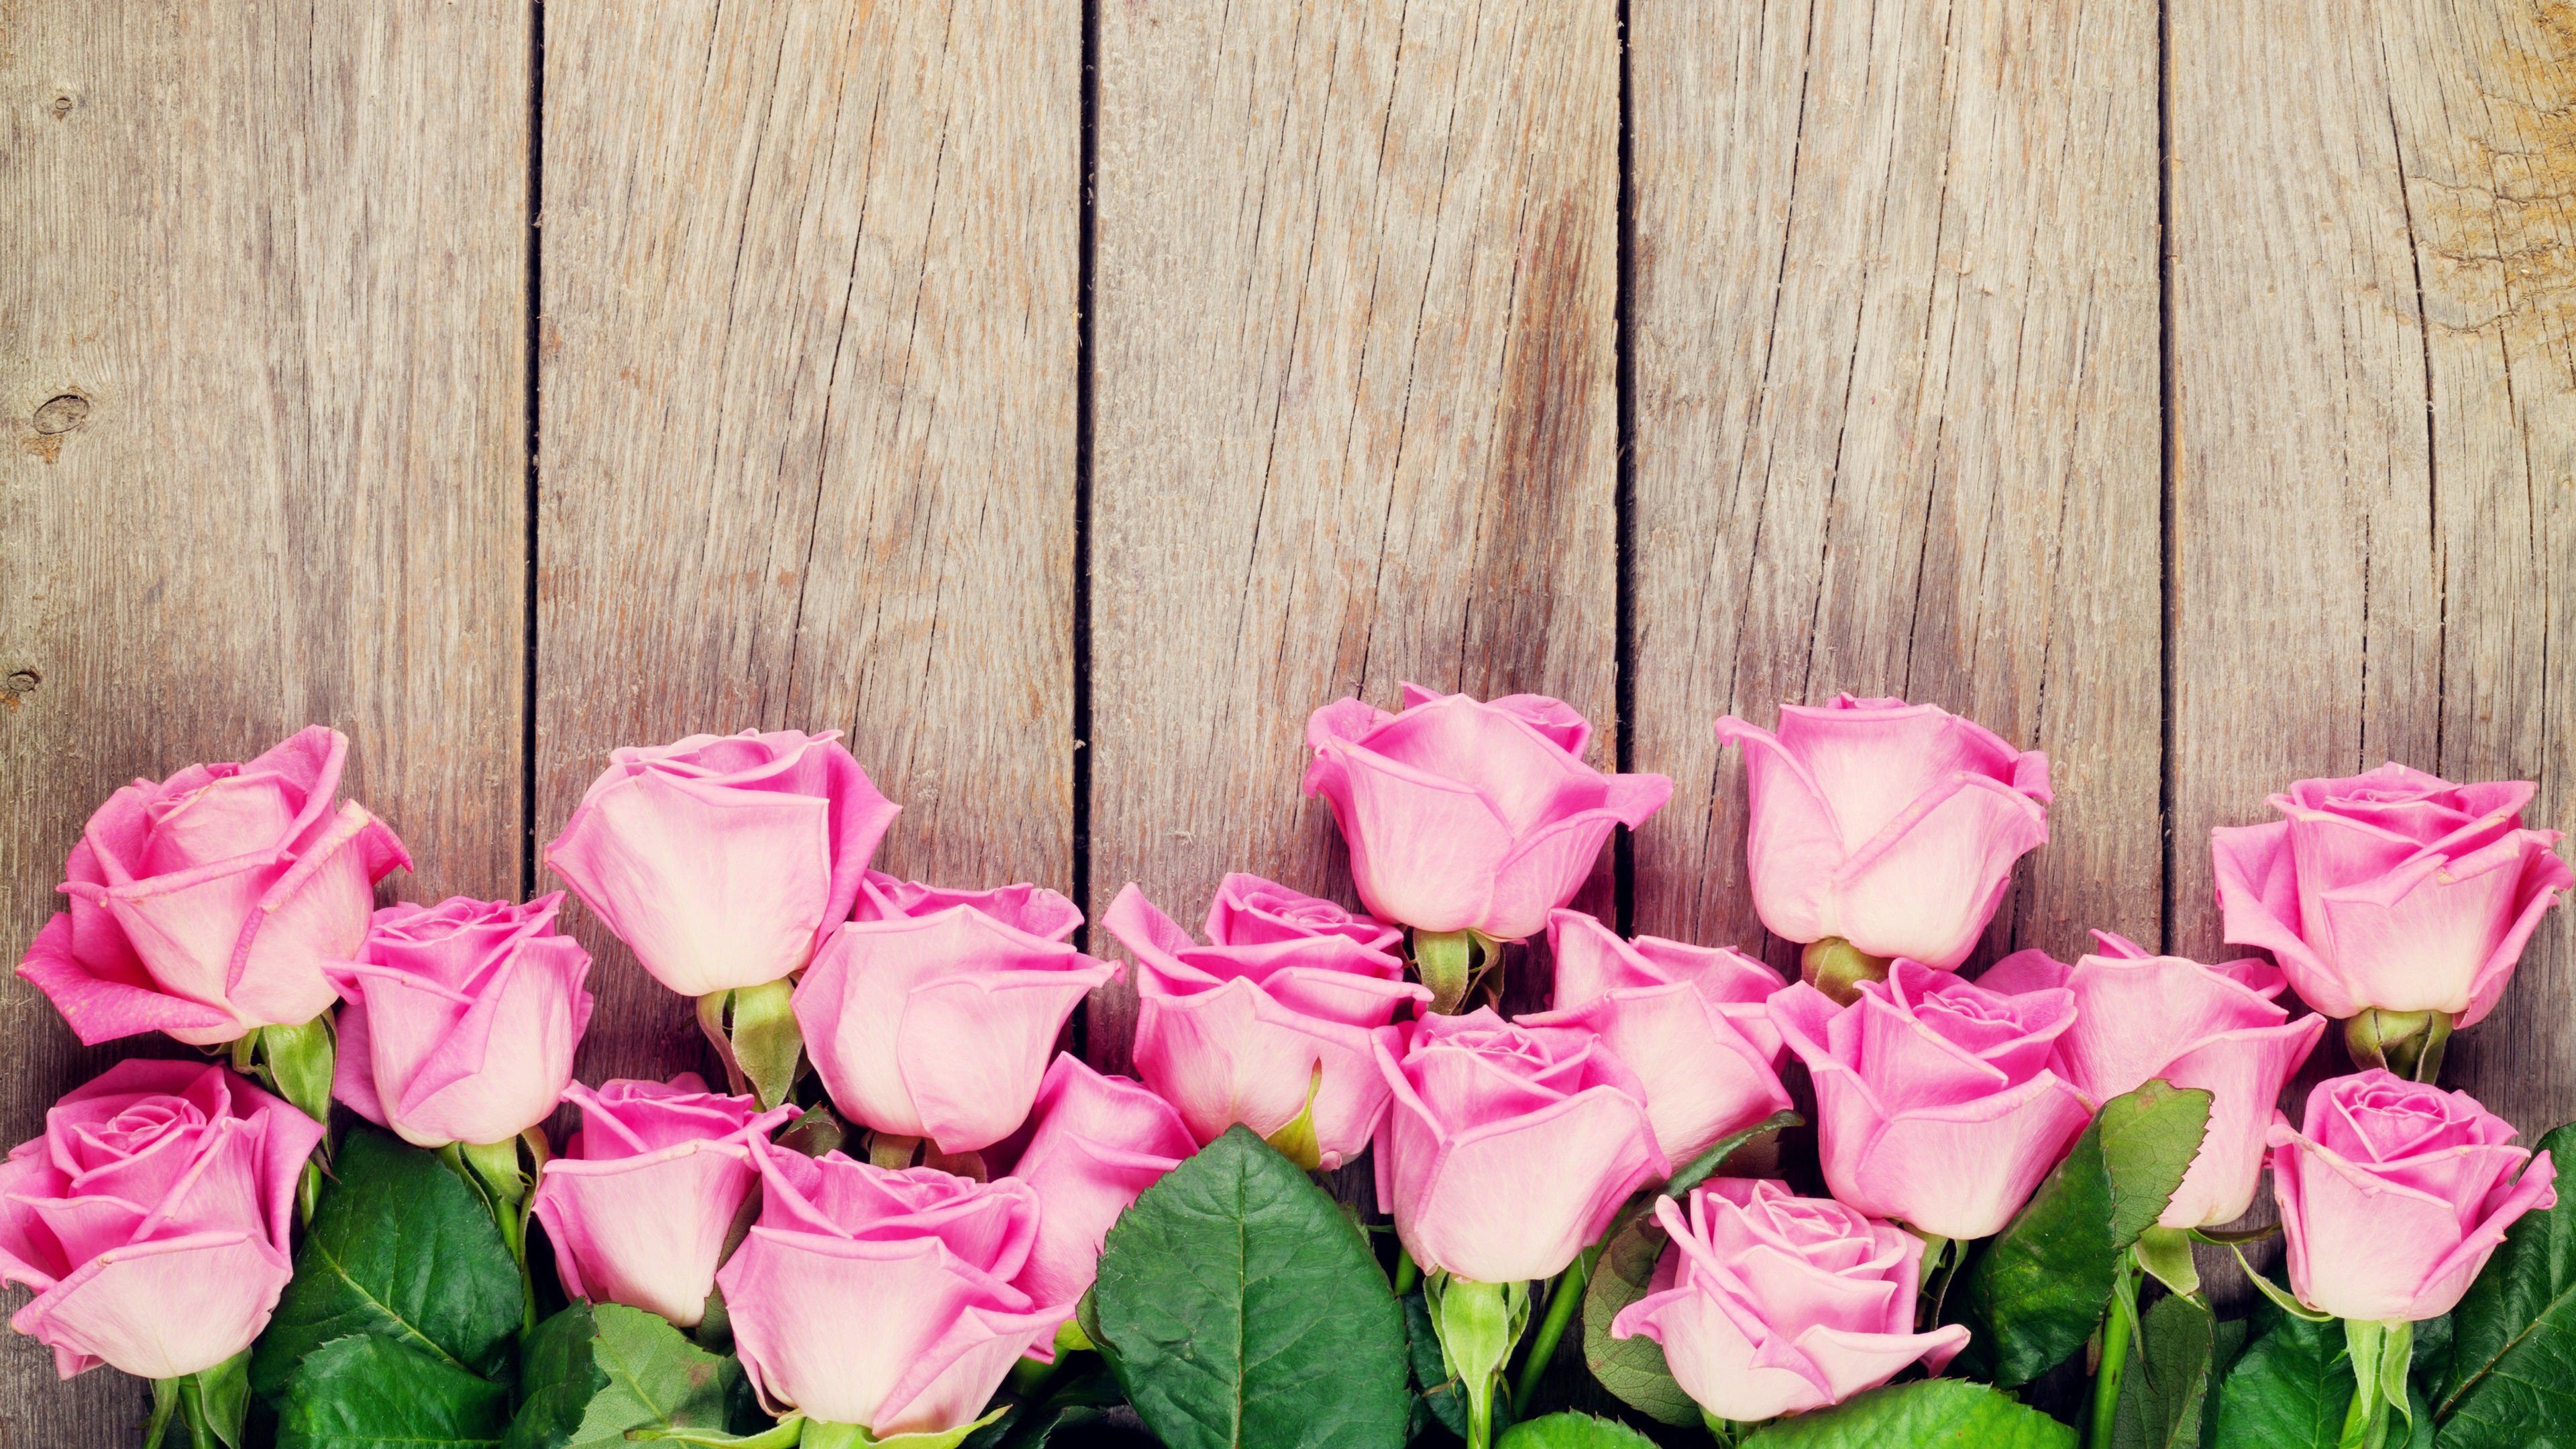 Fondo De Pantalla Flores Rosas: Fondos De Pantalla Rosas Rosadas, Fondo De Madera